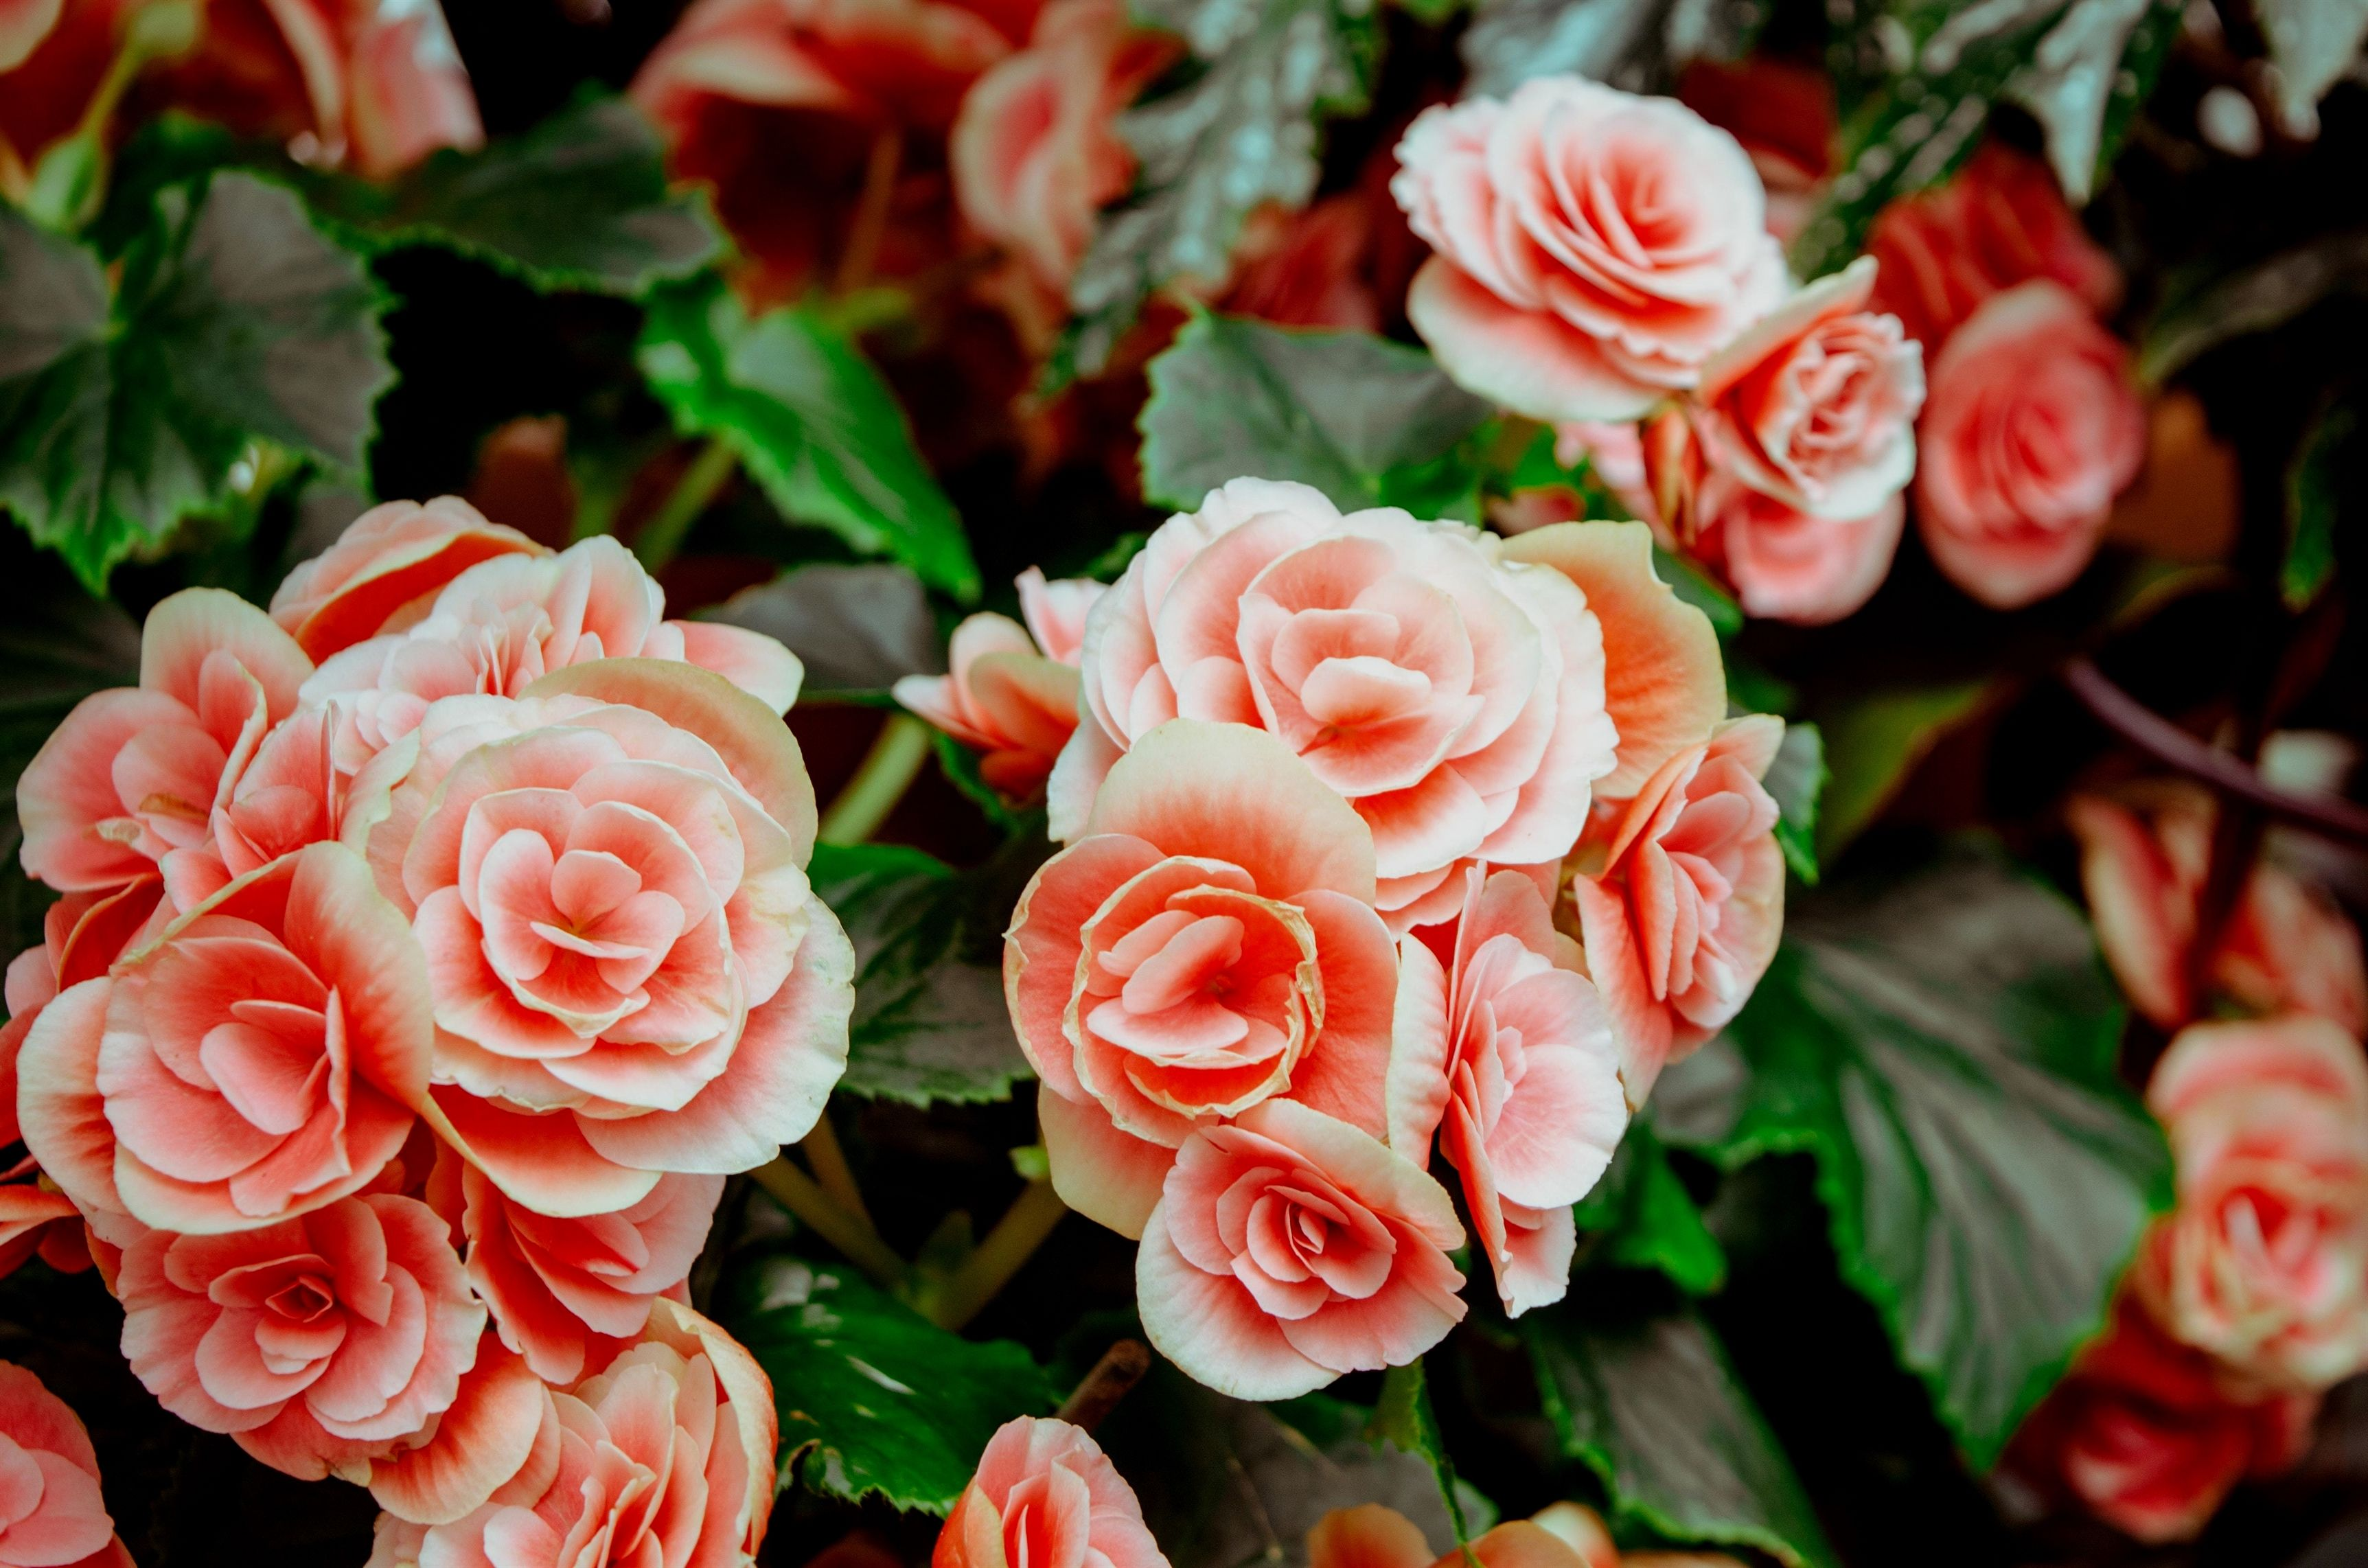 gardening seeds_38_20181126052449_53 gardening blogs in